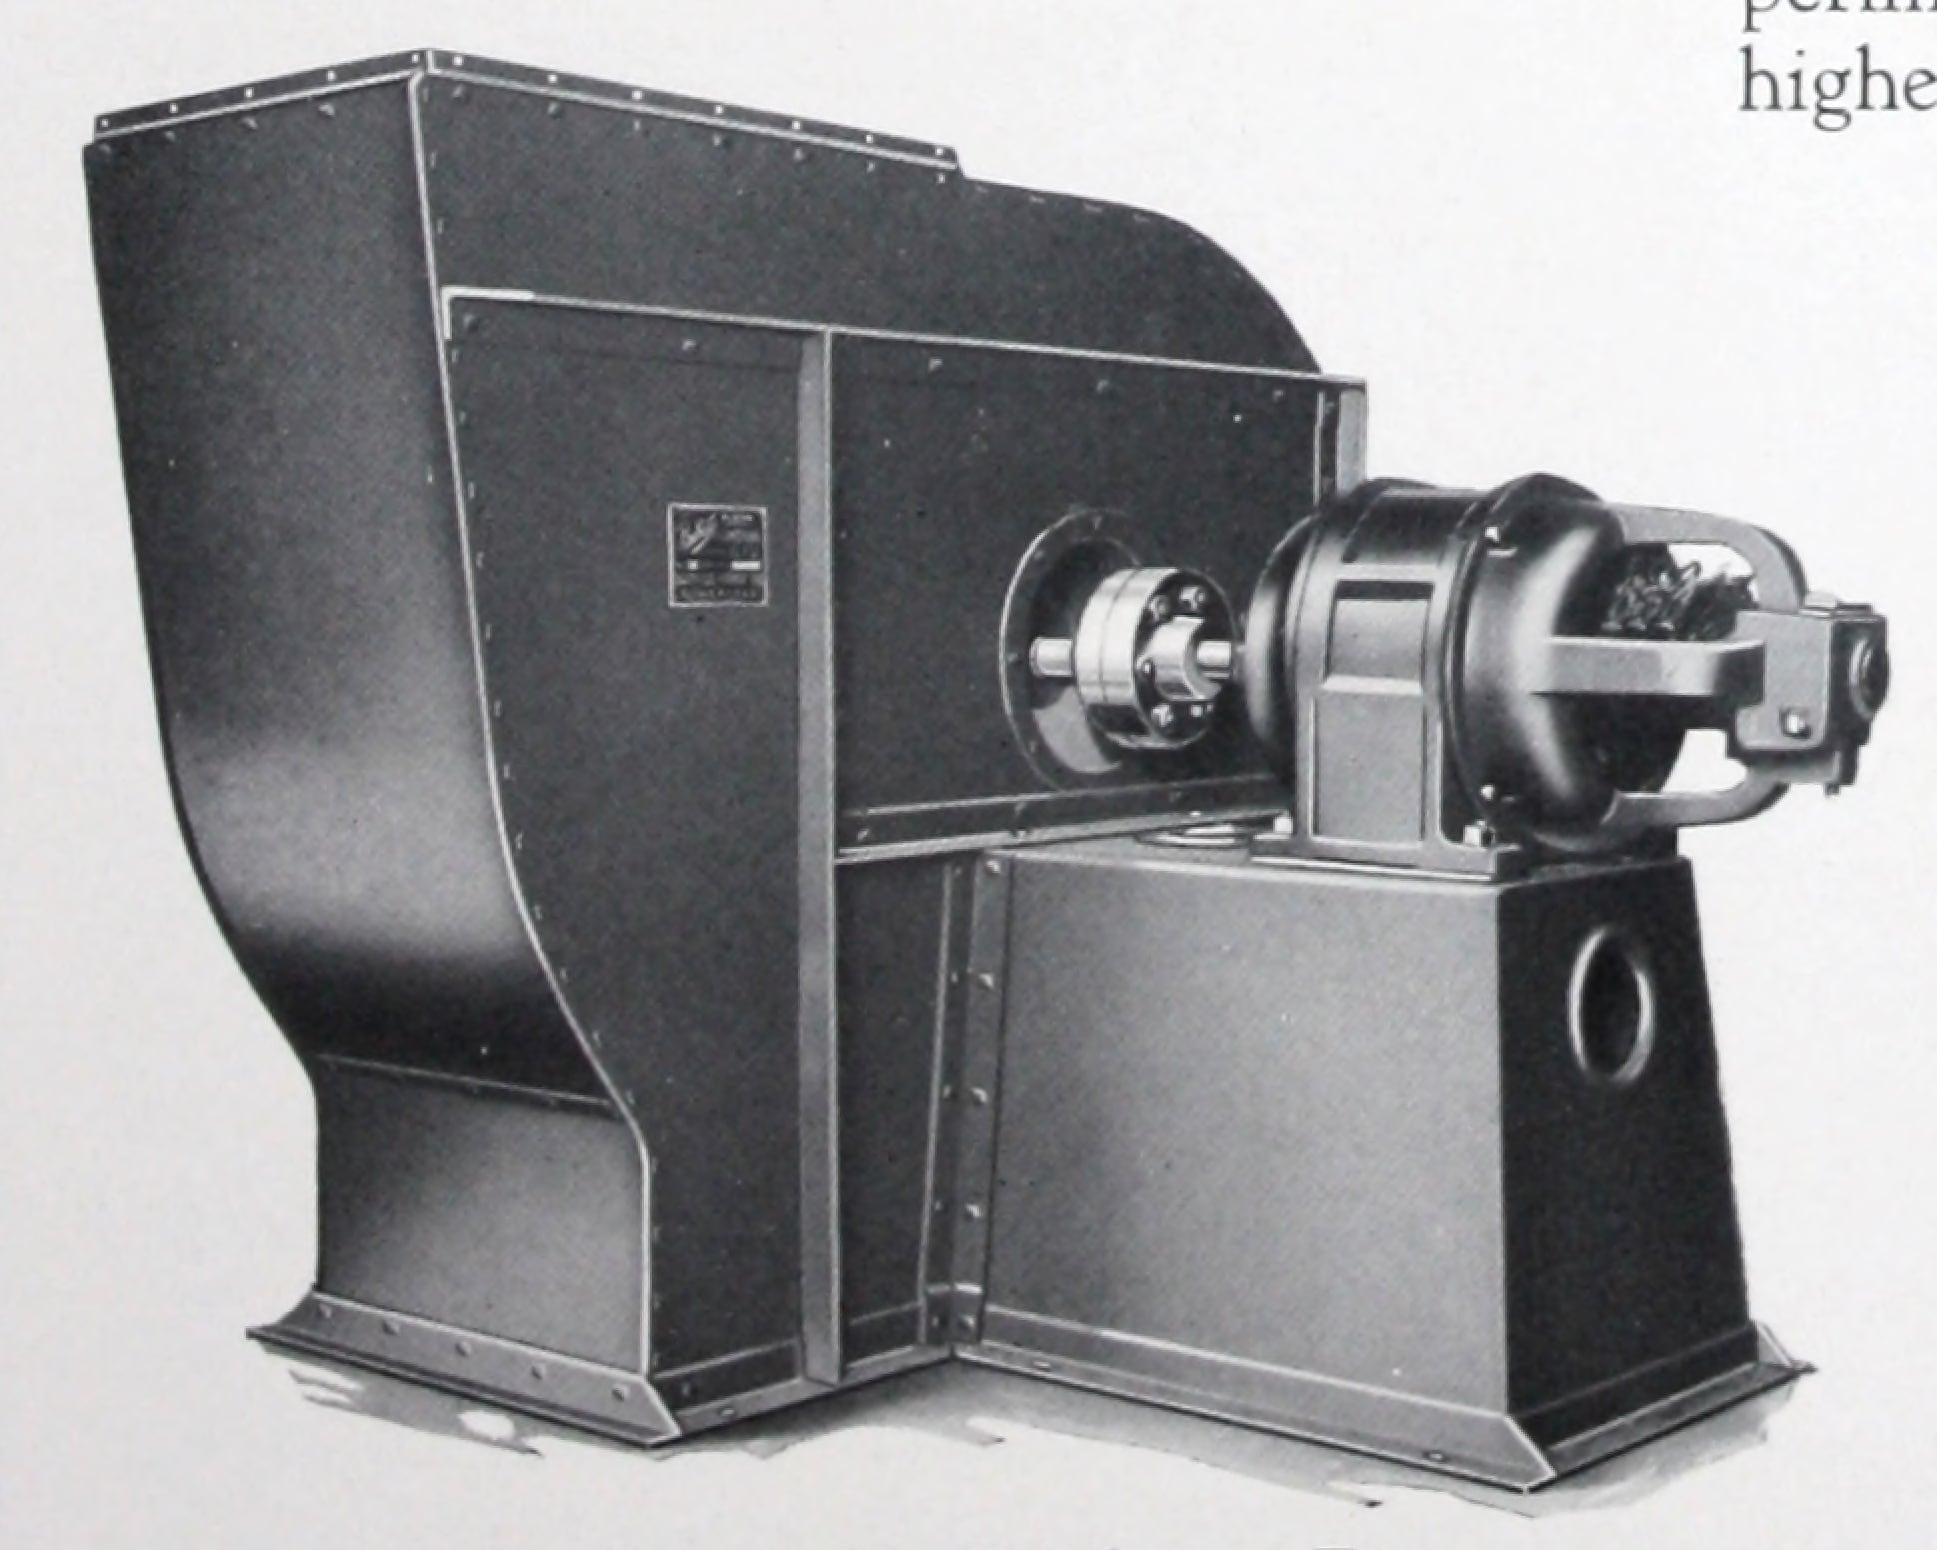 Buffalo conoidal ventilating fans - duplex and turbo.